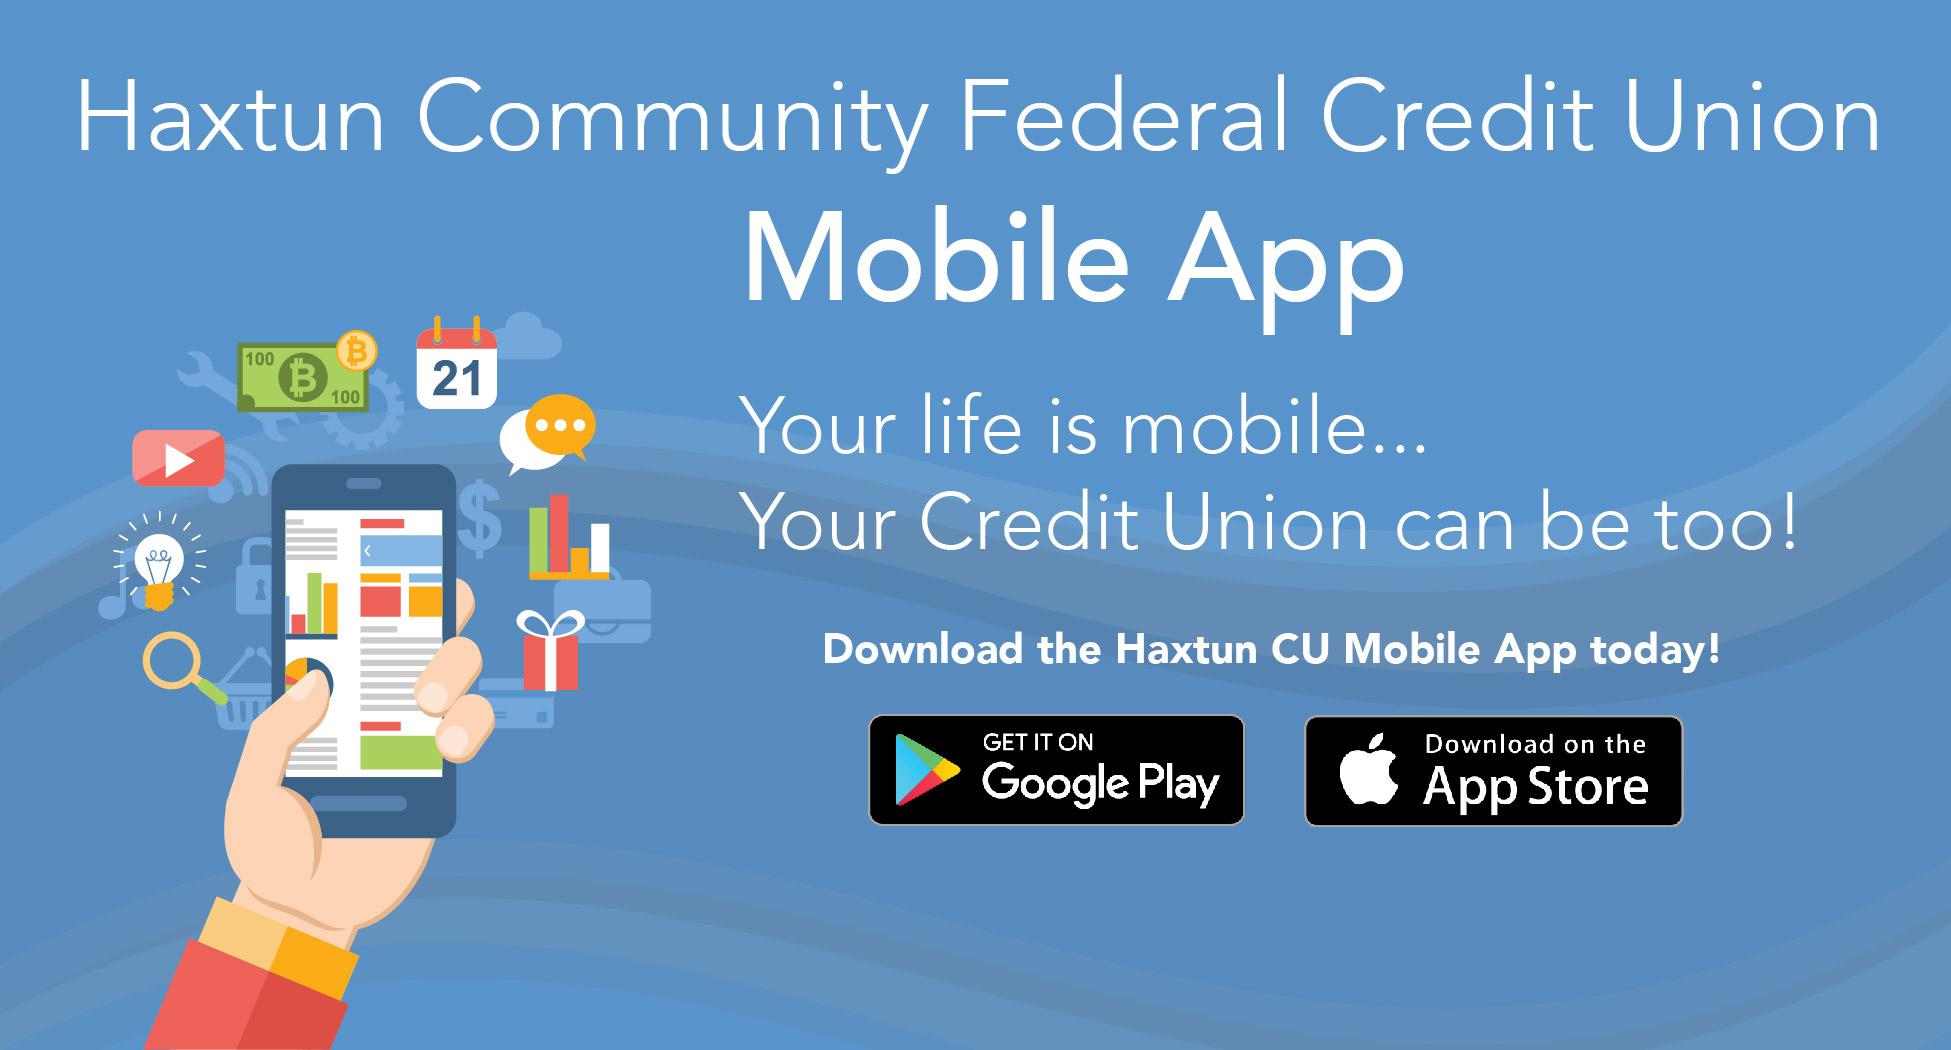 Haxtun Community FCU Mobile App